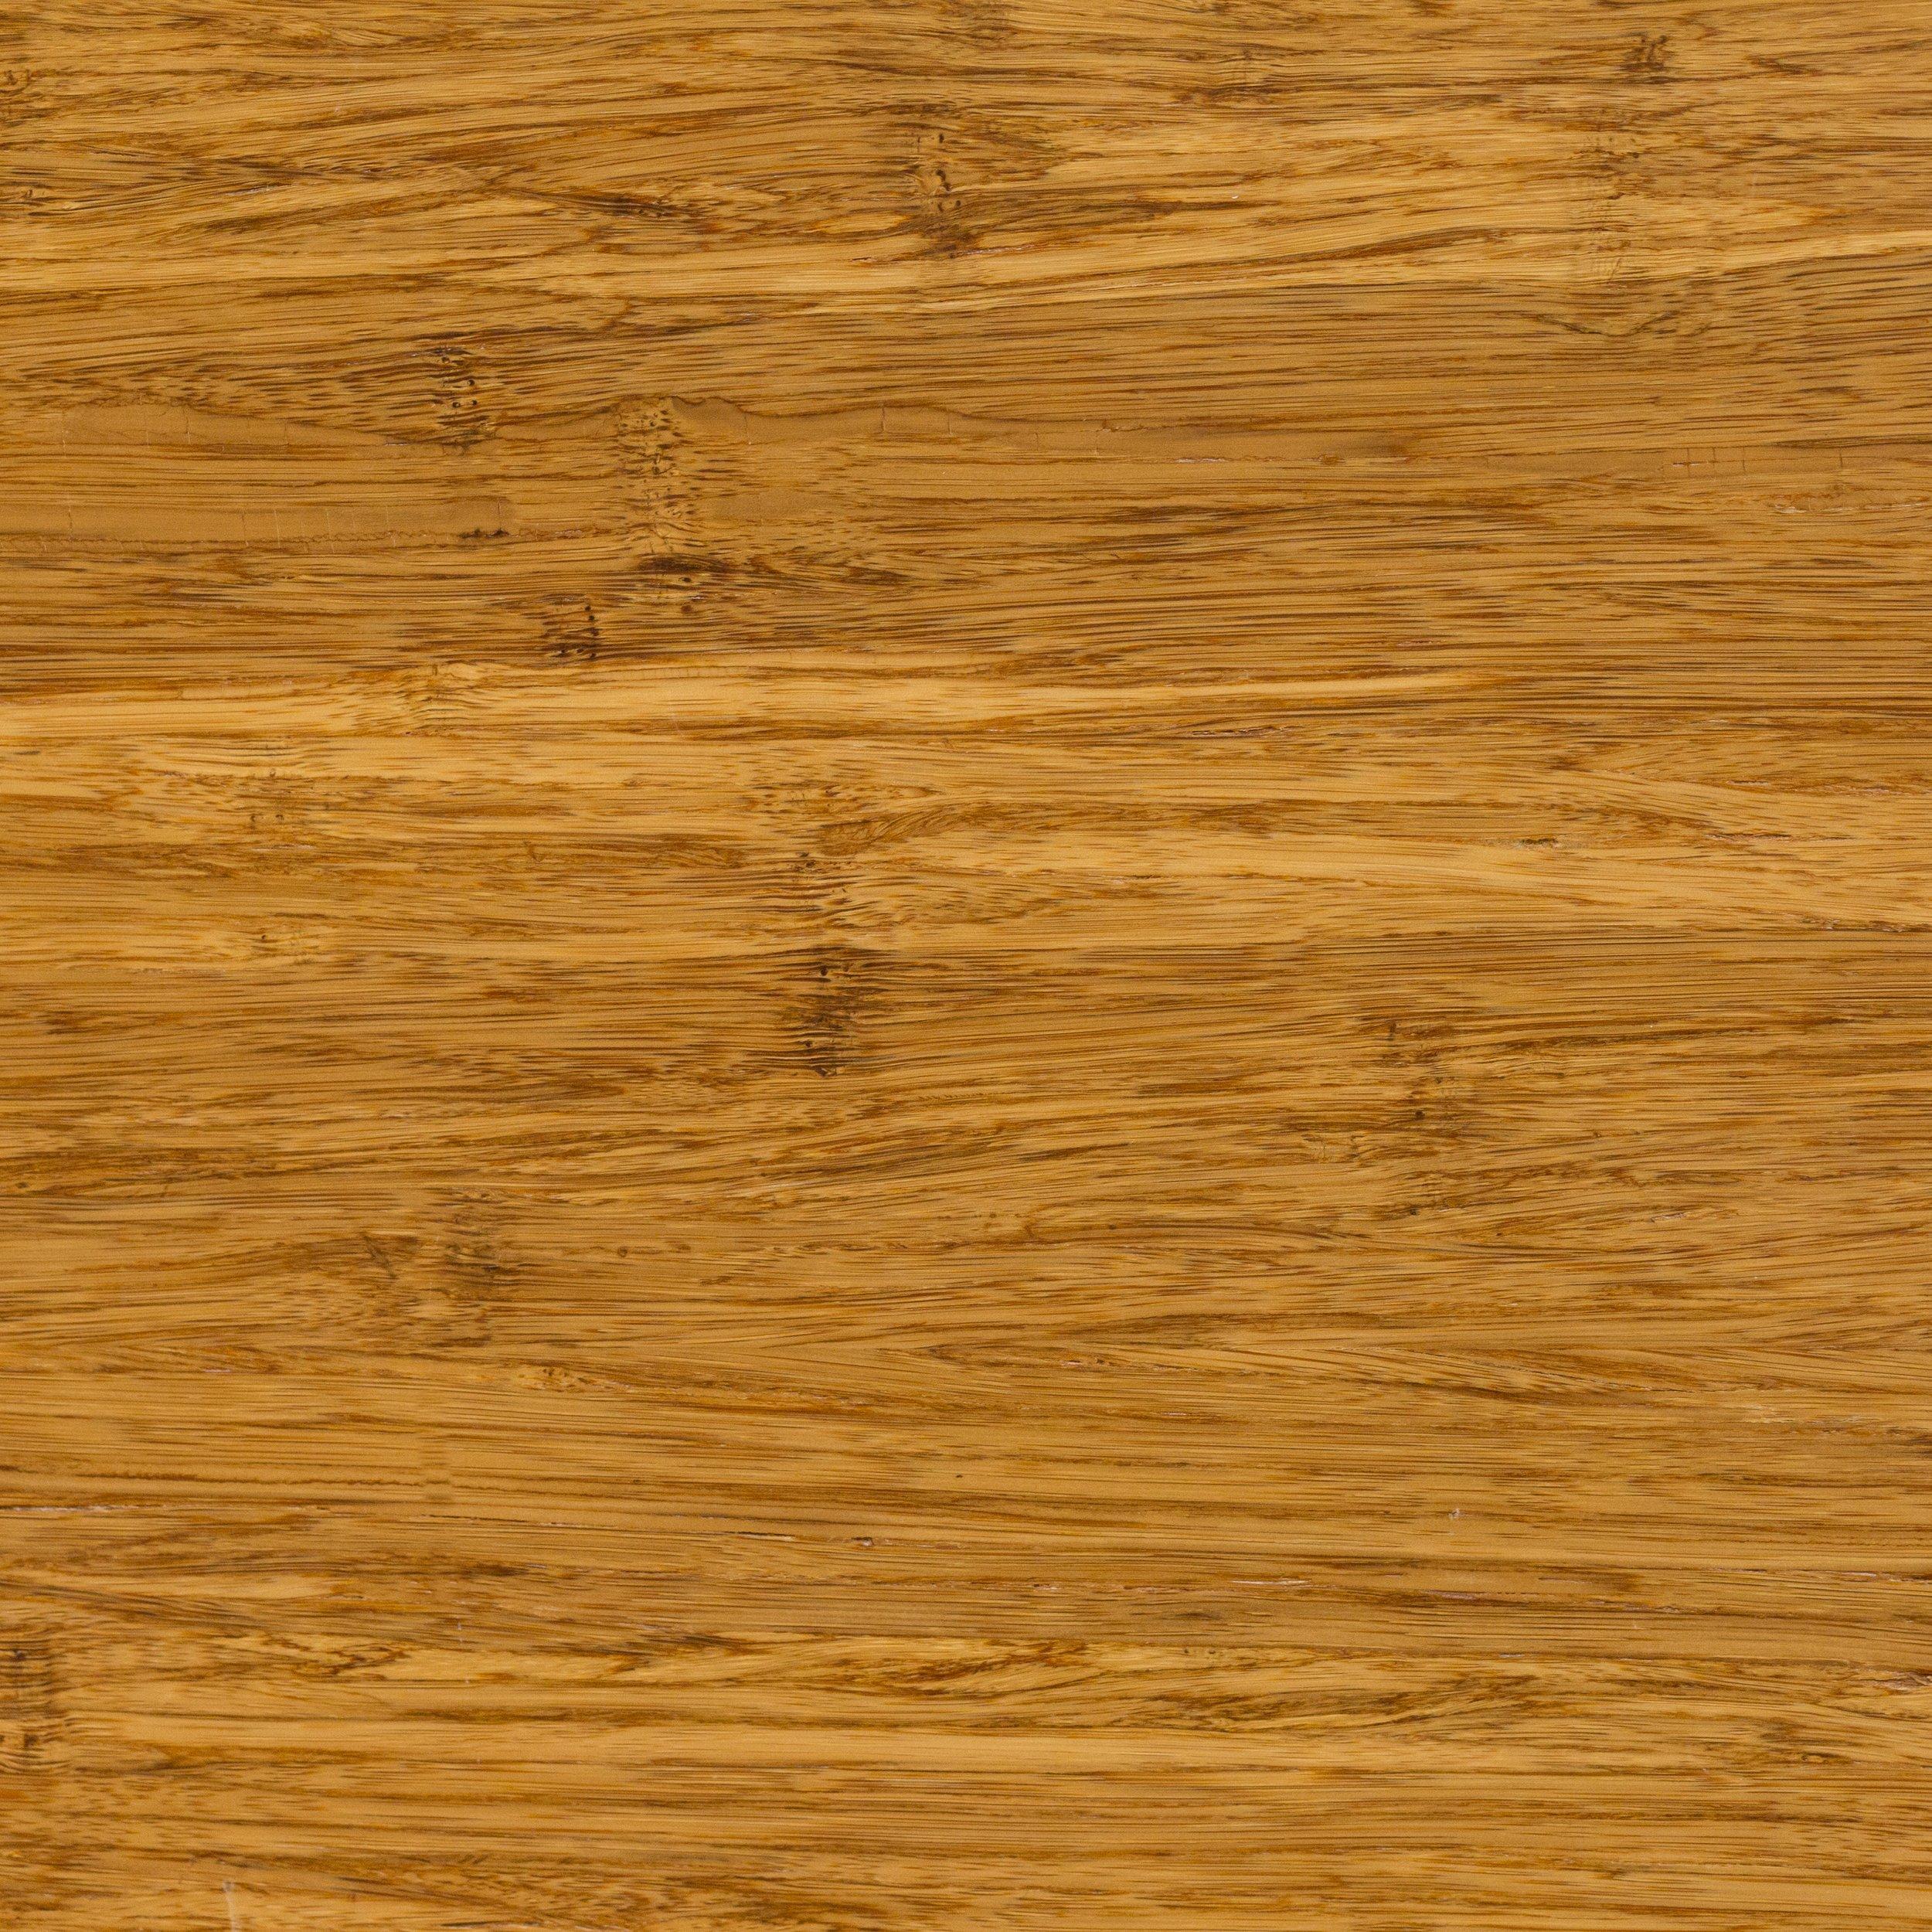 bamboo strand butcher block countertop 12ft